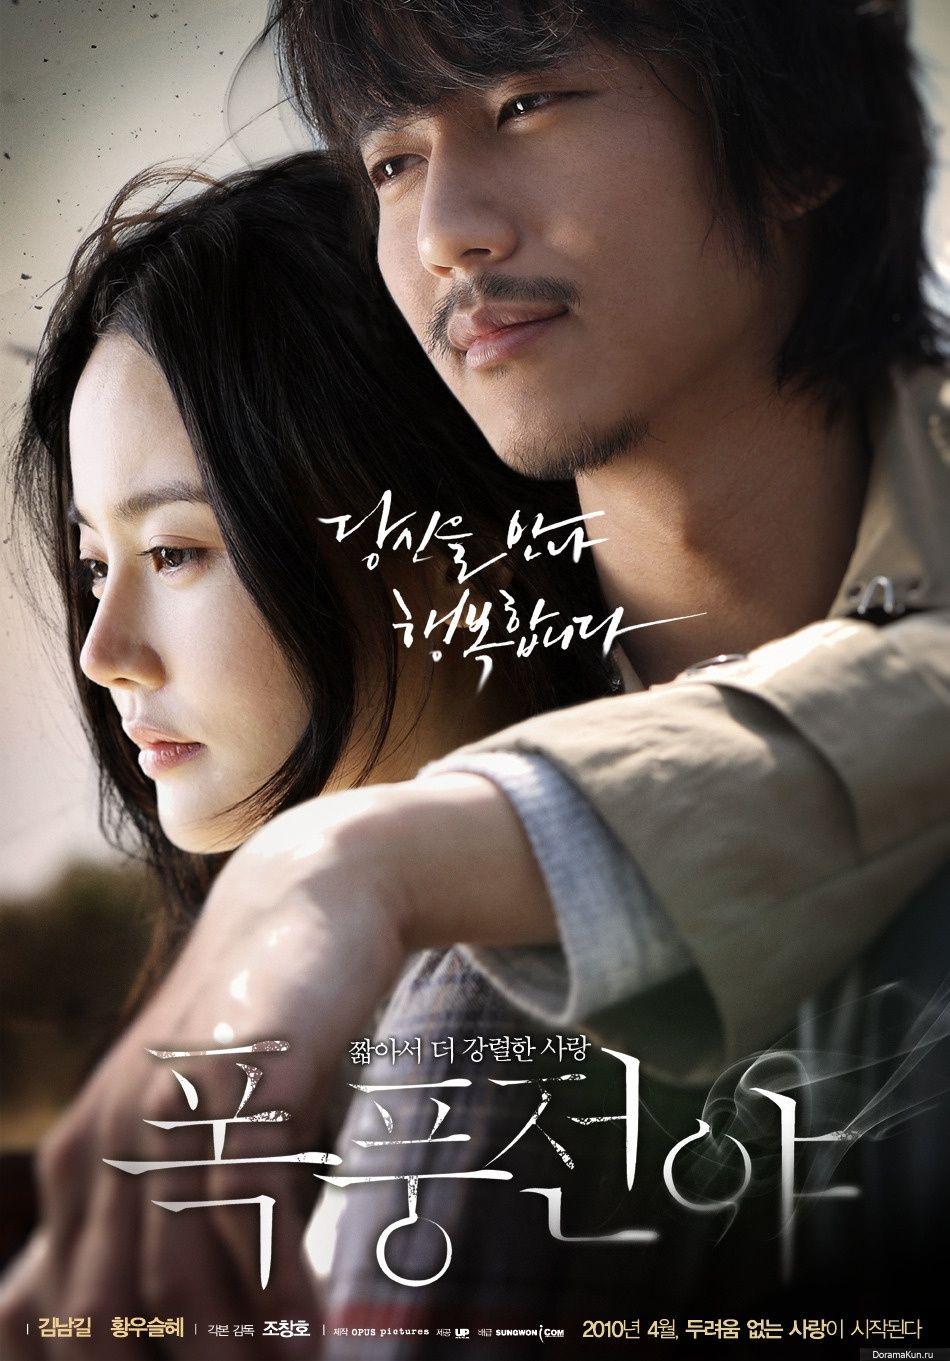 Pin by lika on Korean Movies Korean drama movies, Korean